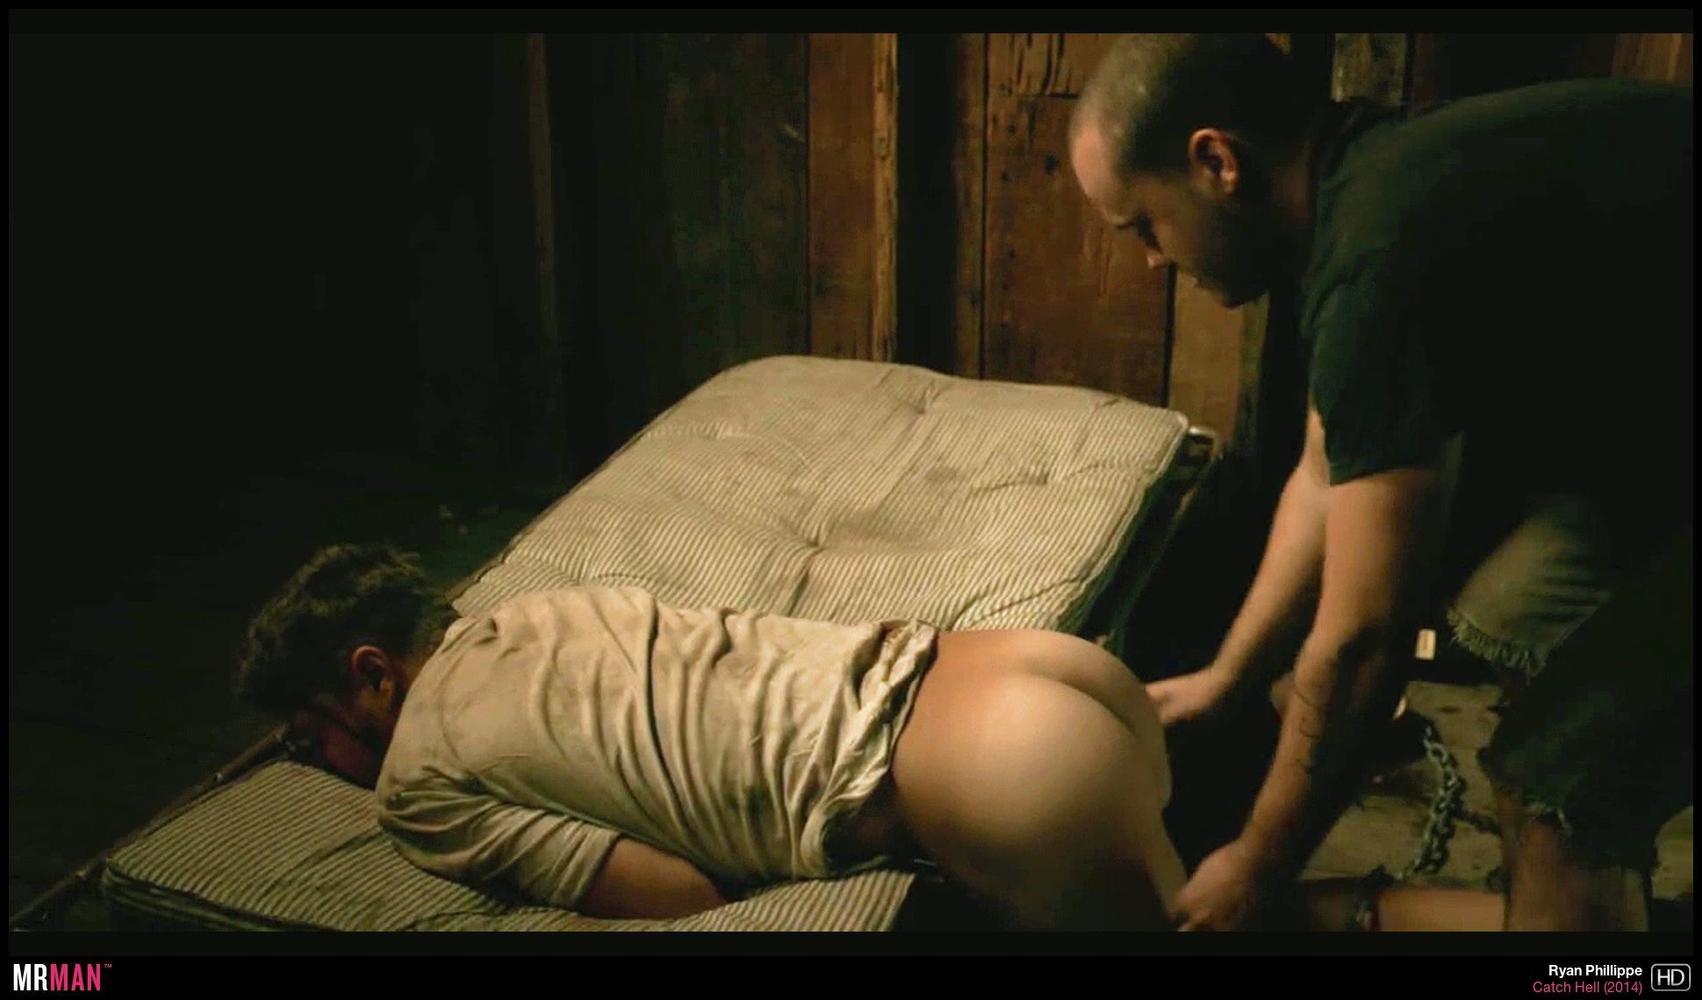 X-ray hentai anal porn videos